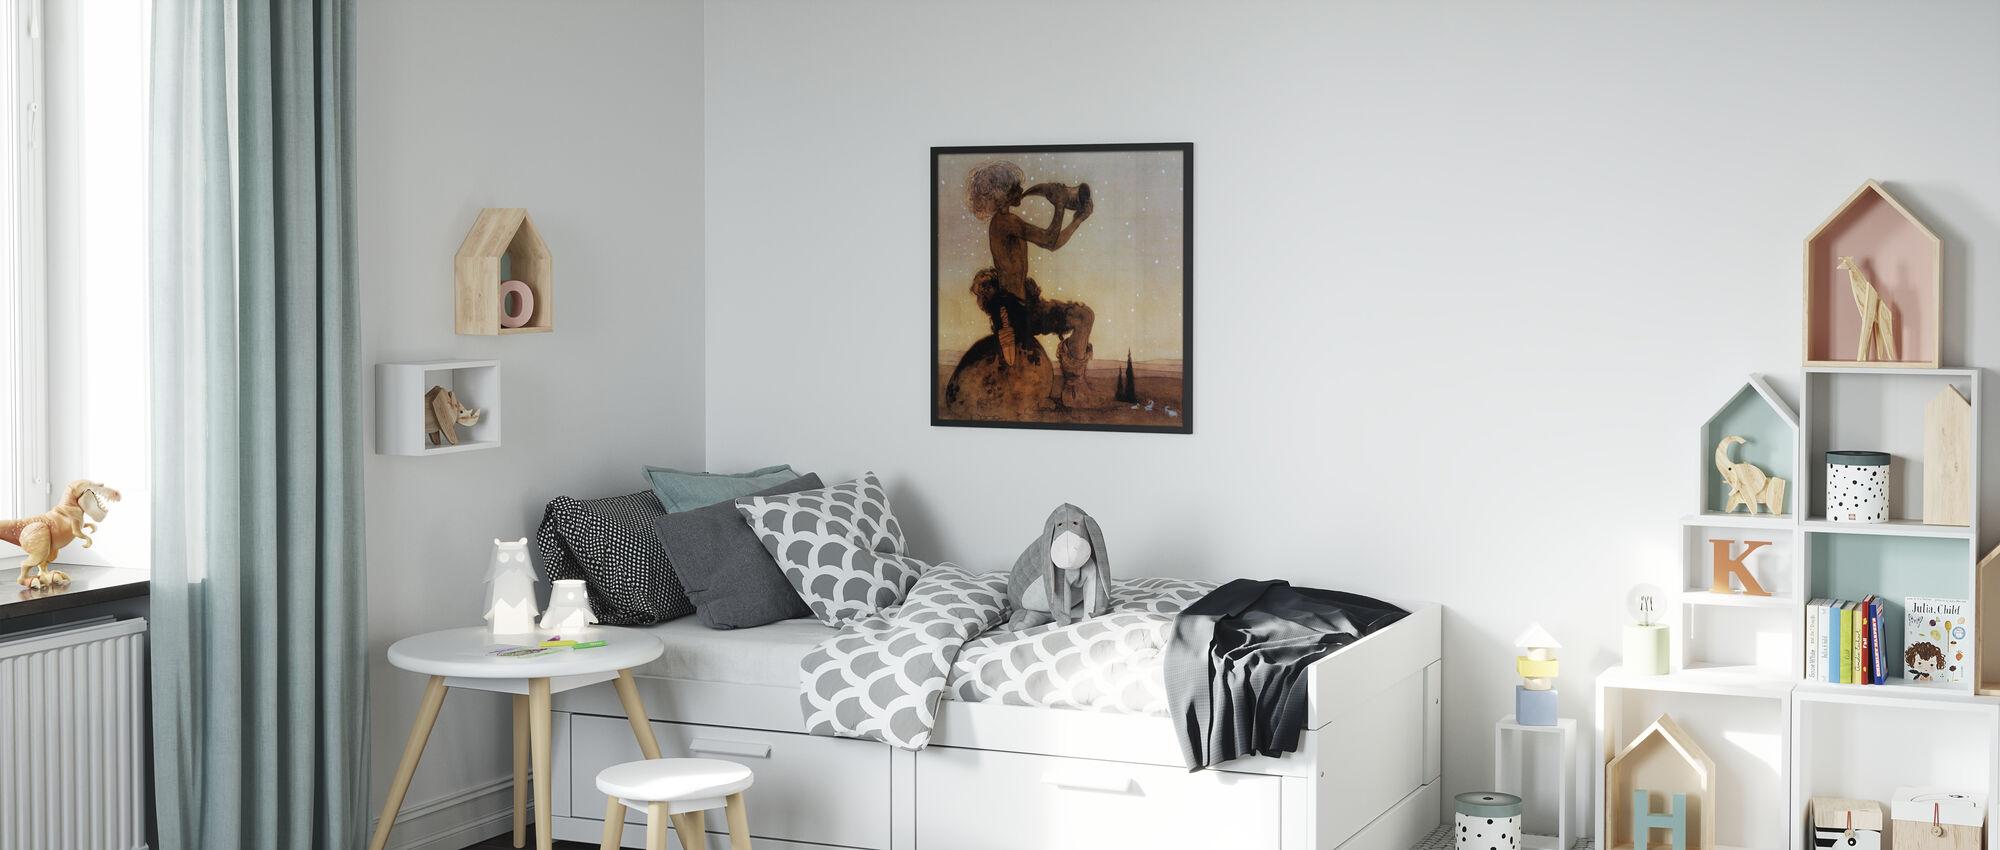 John Bauer - Vil-Vallareman - Poster - Kinderzimmer